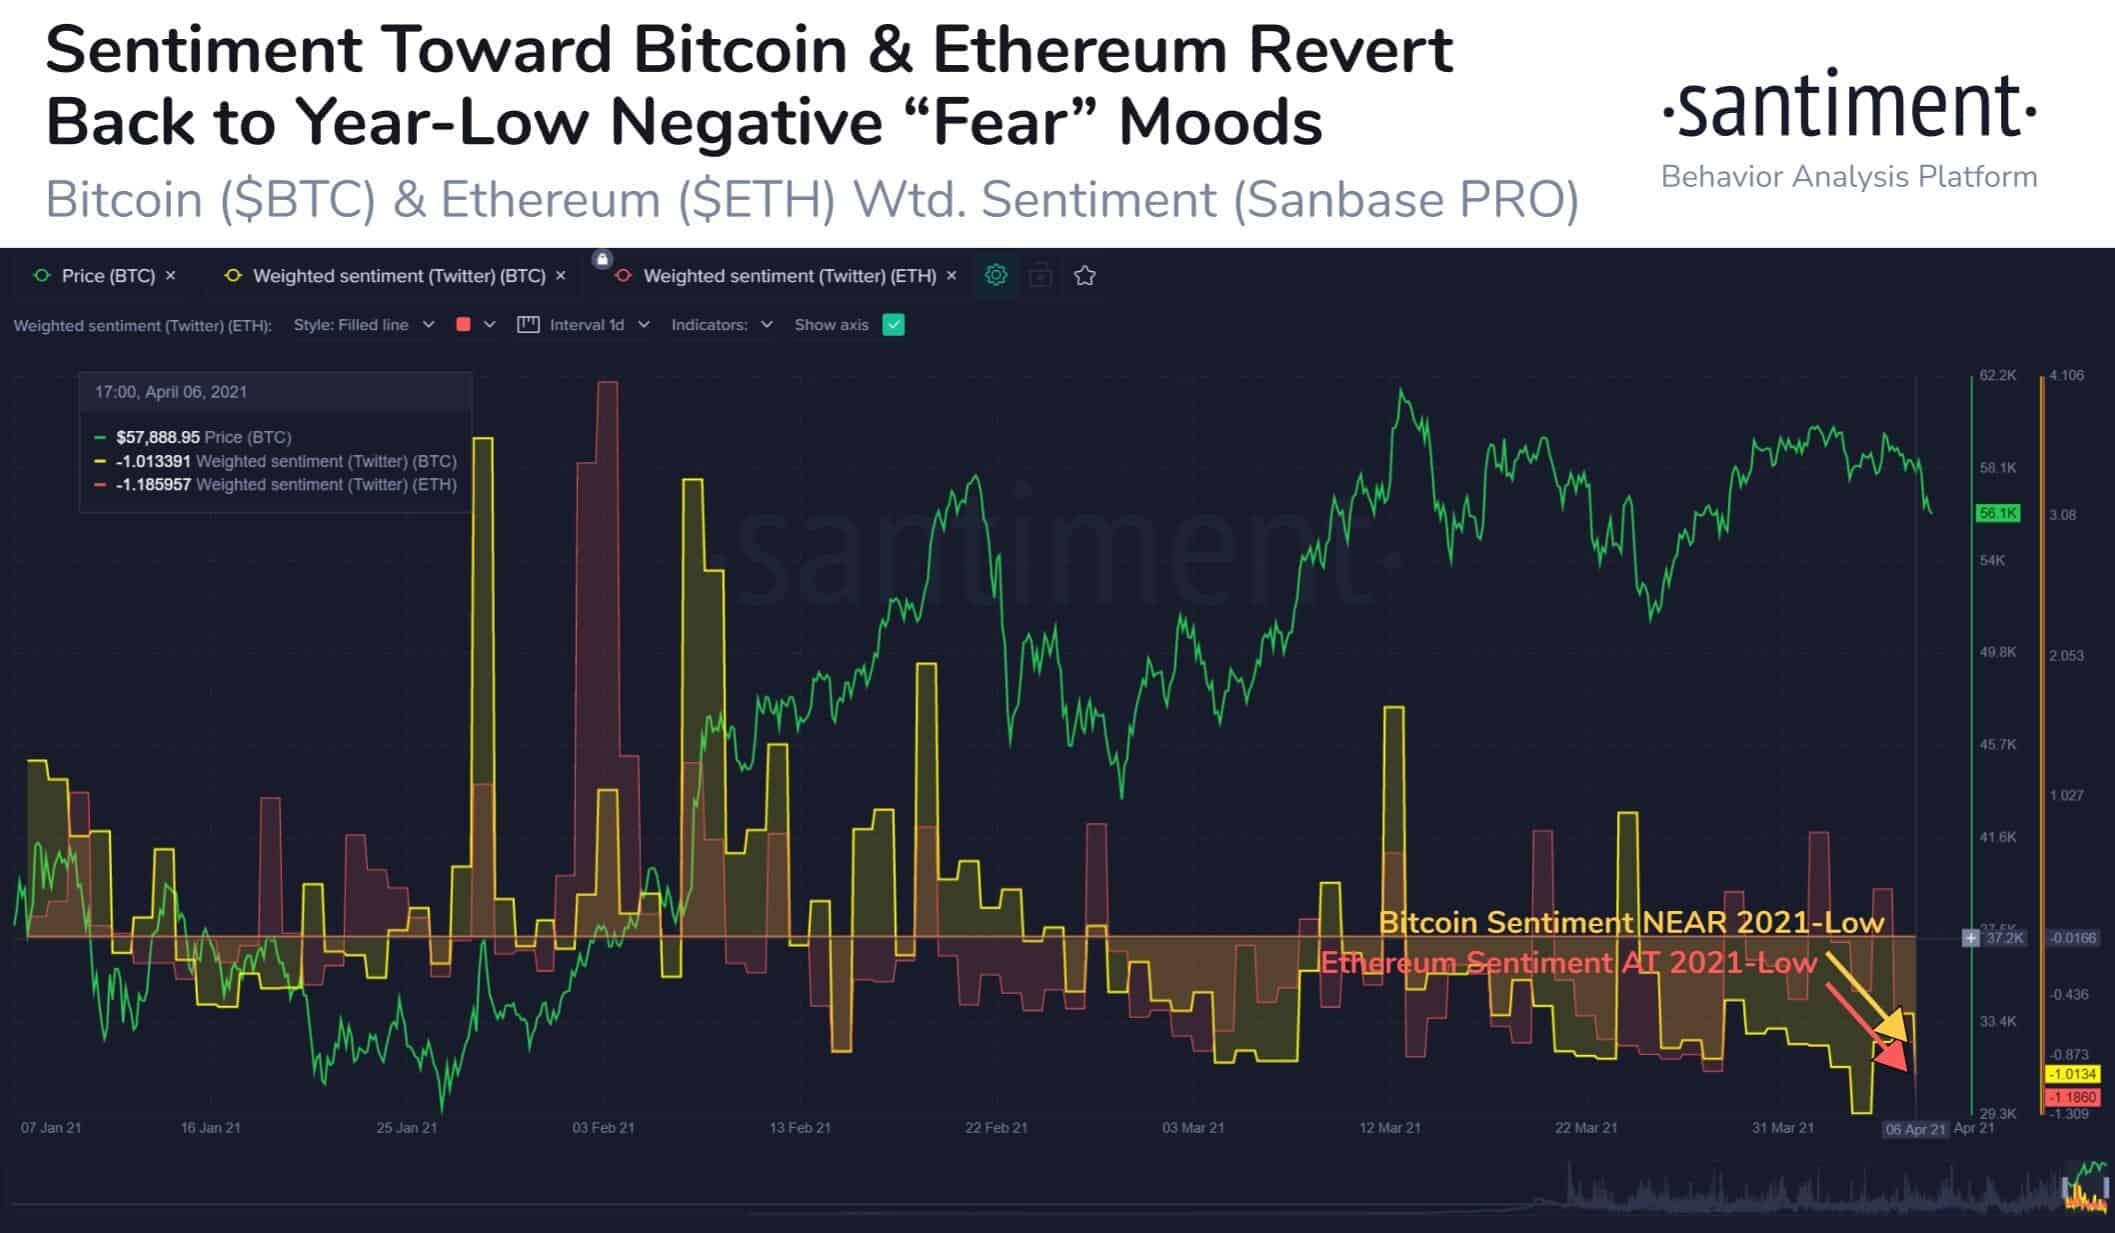 General Sentiment Towards Bitcoin and Ethereum. Source: Santiment